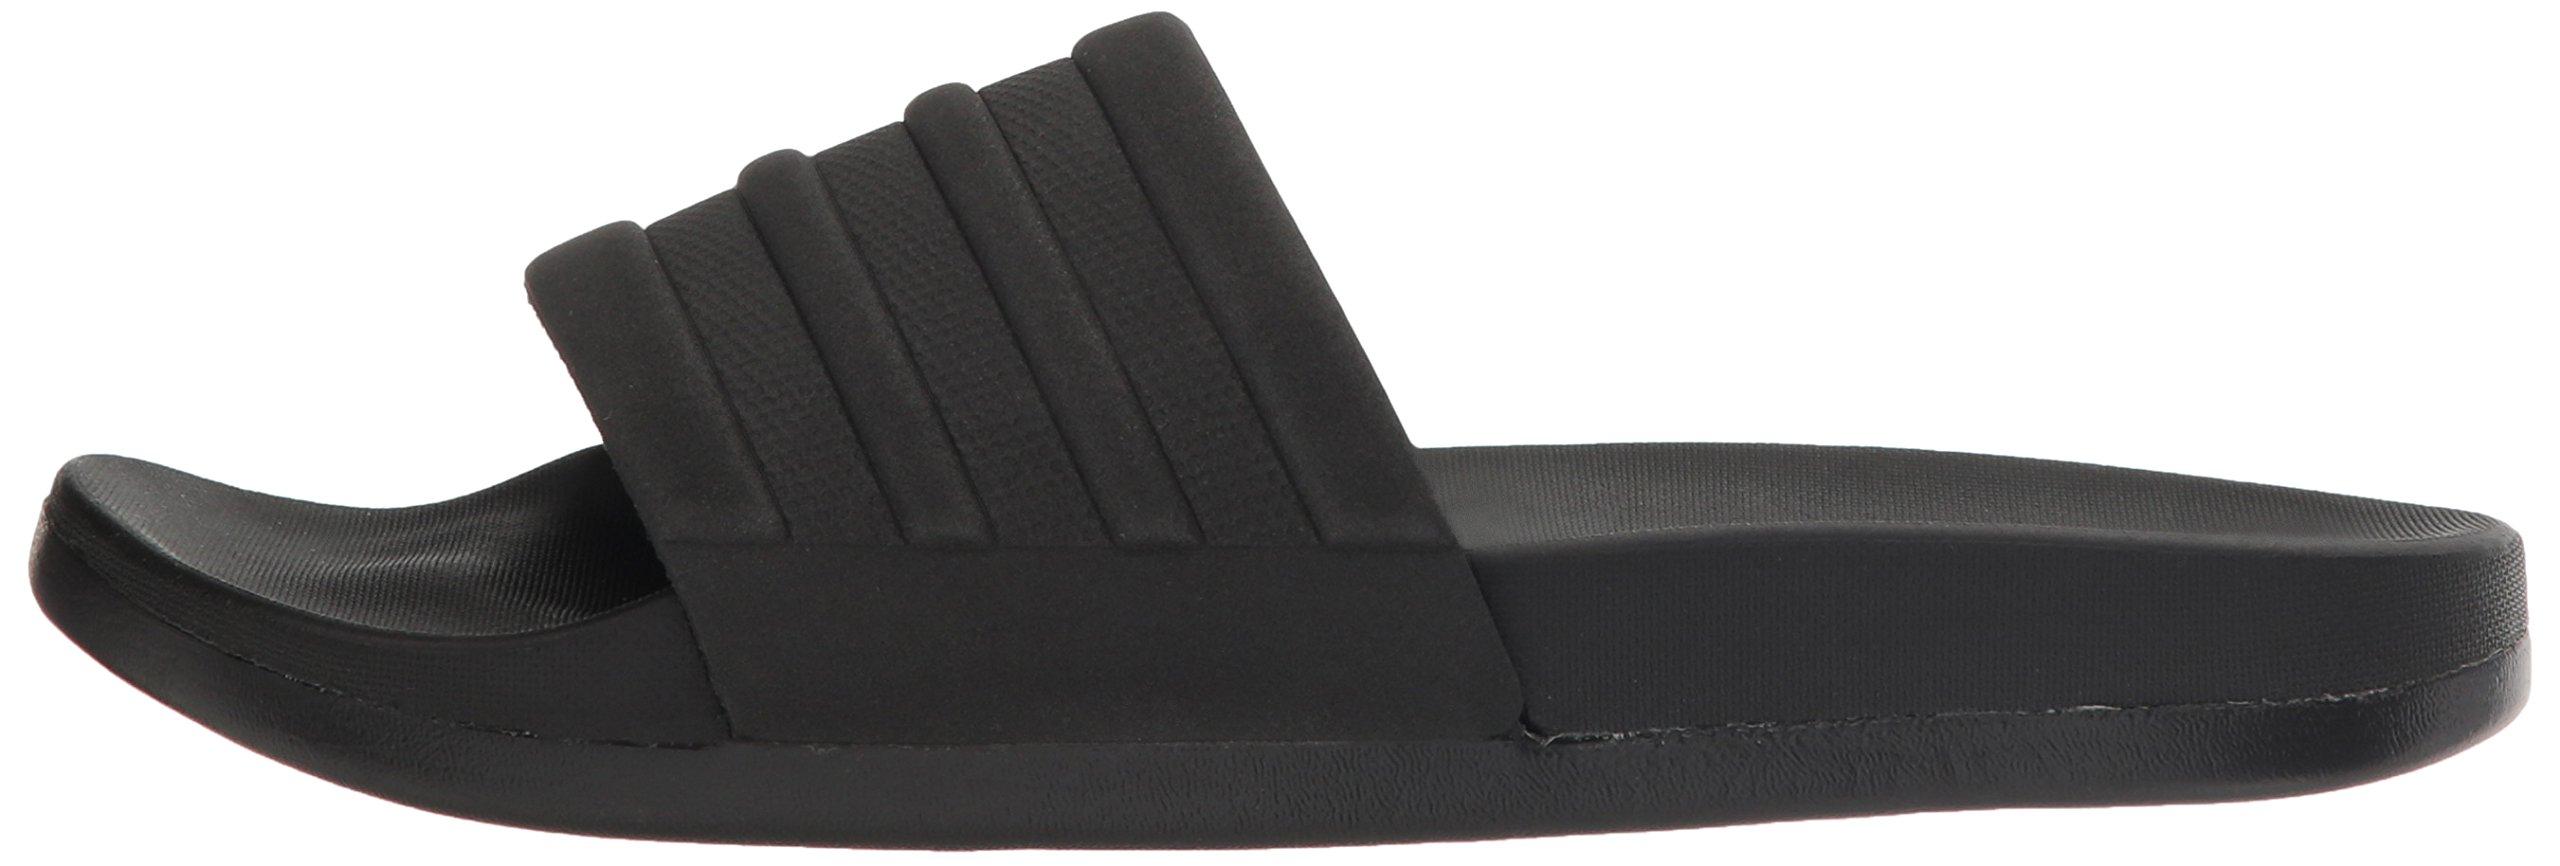 61f4a3c61b4 adidas Men s Adilette Comfort Slide Sandals